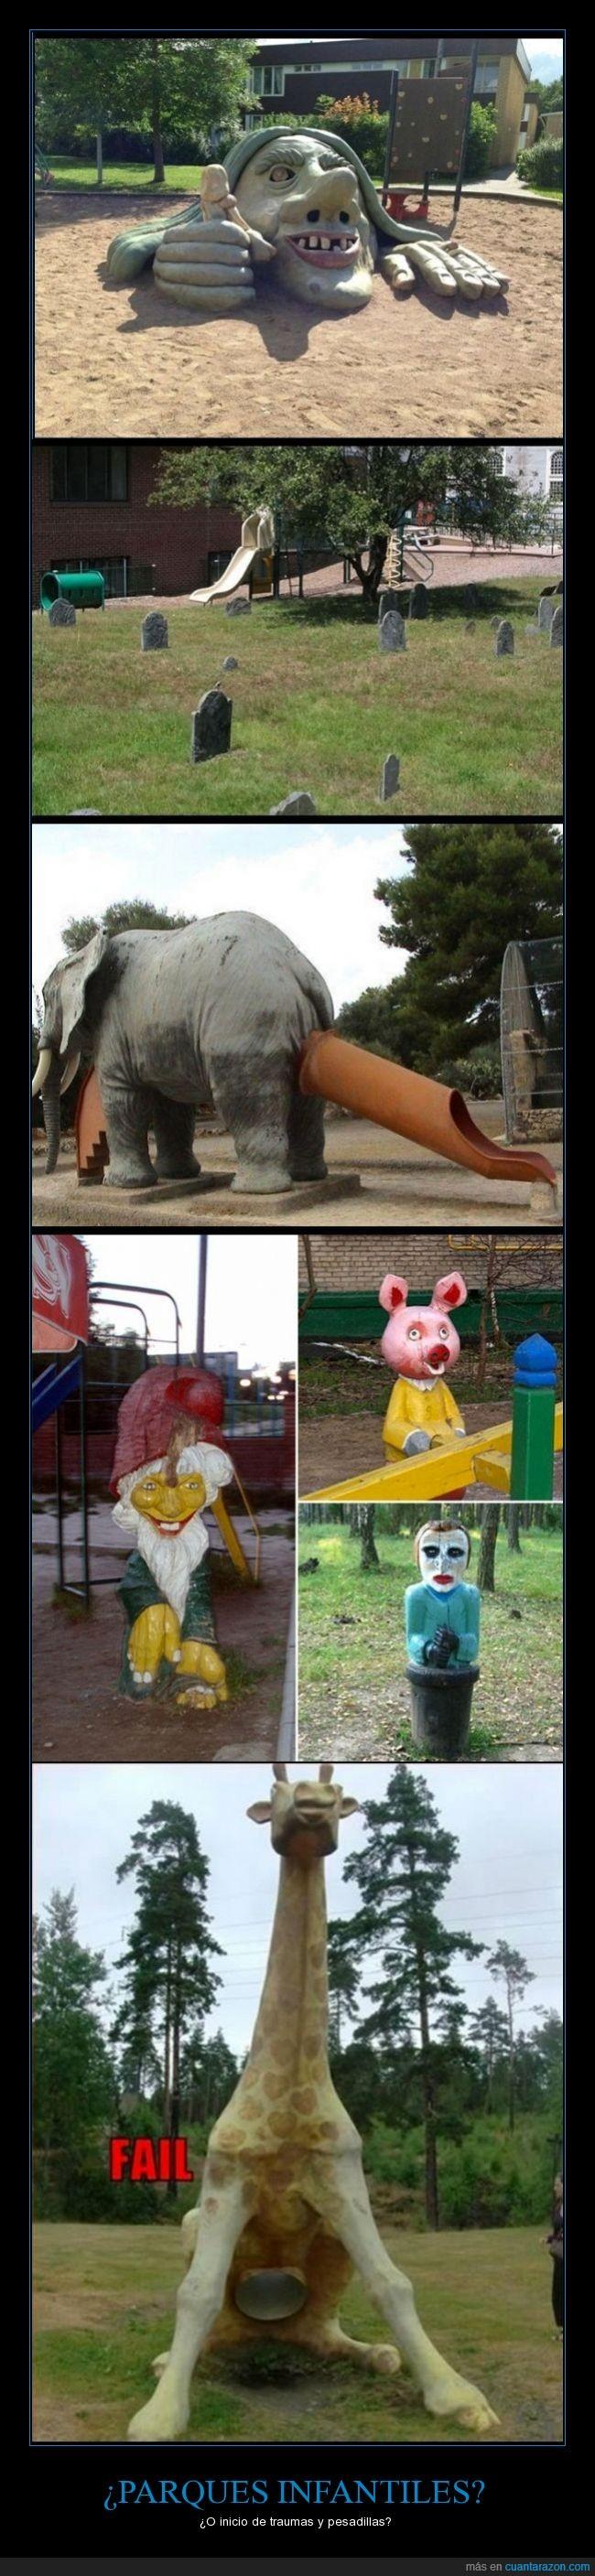 bruja,cementerio,elefante,gorma,infantiles,jirafa,miedo,parques,¿Qué estaban pensando?